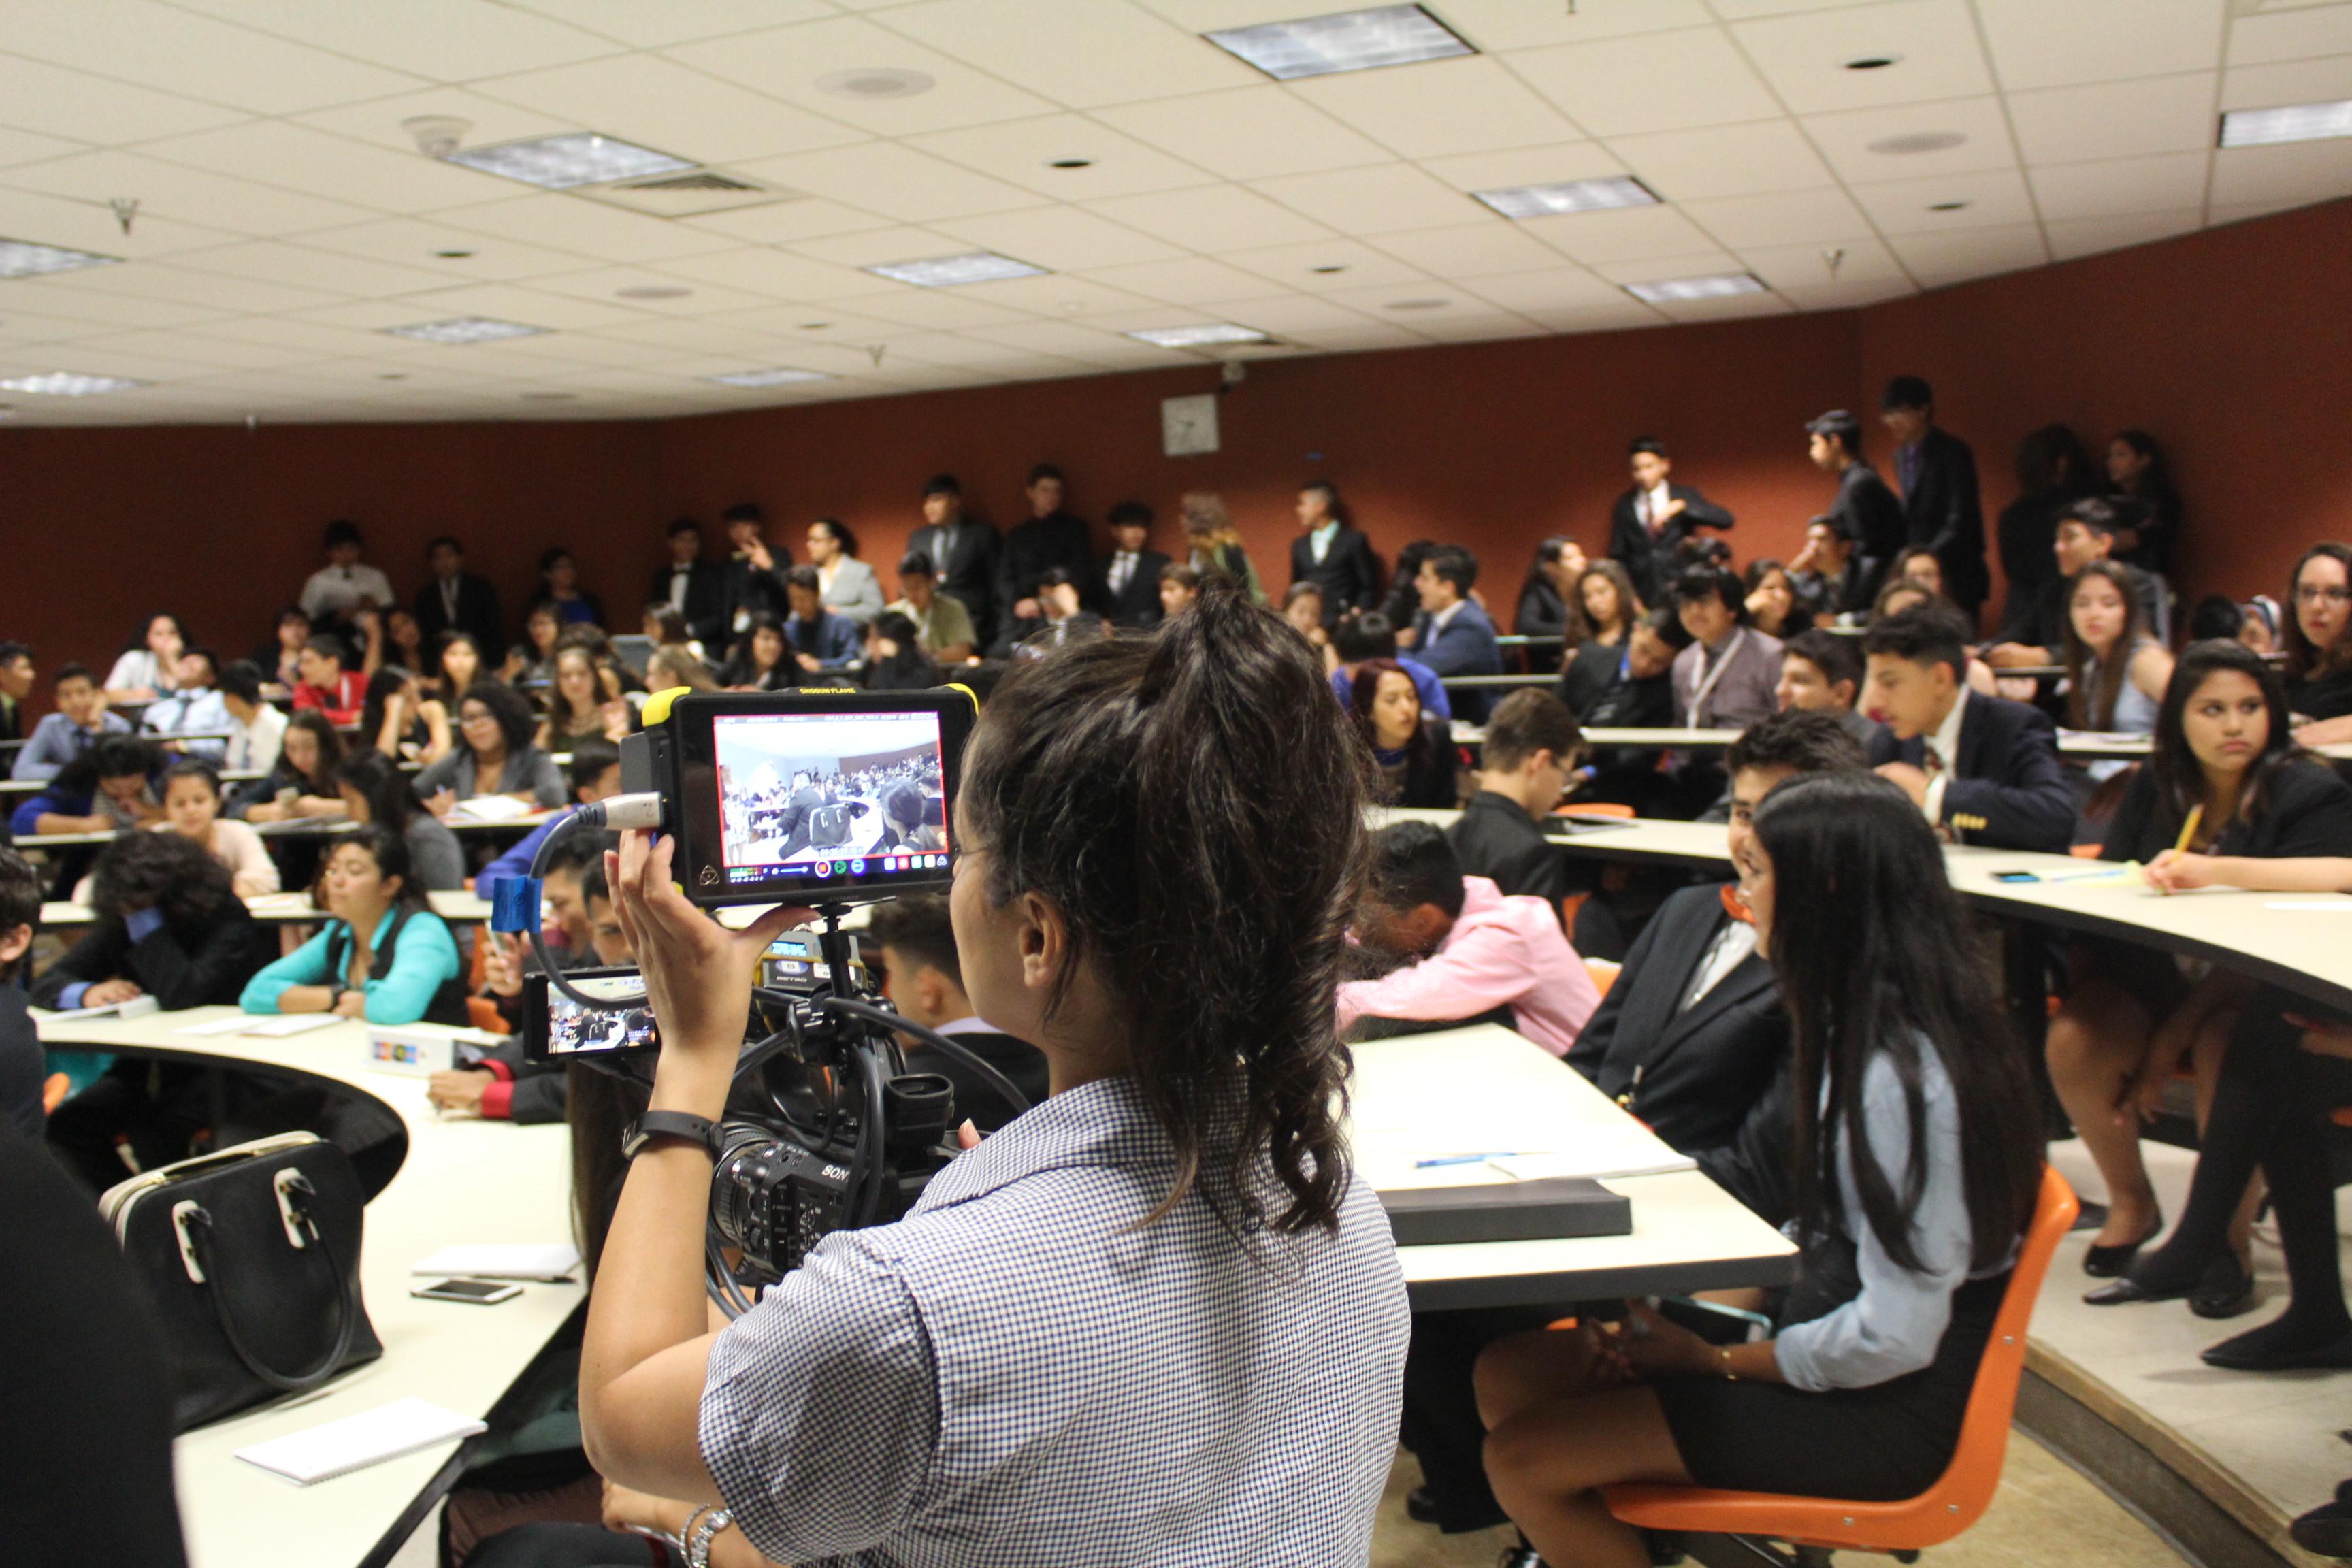 A member of the DishLATINO crew films students at the 2016 Texas Ambassador Great Debate